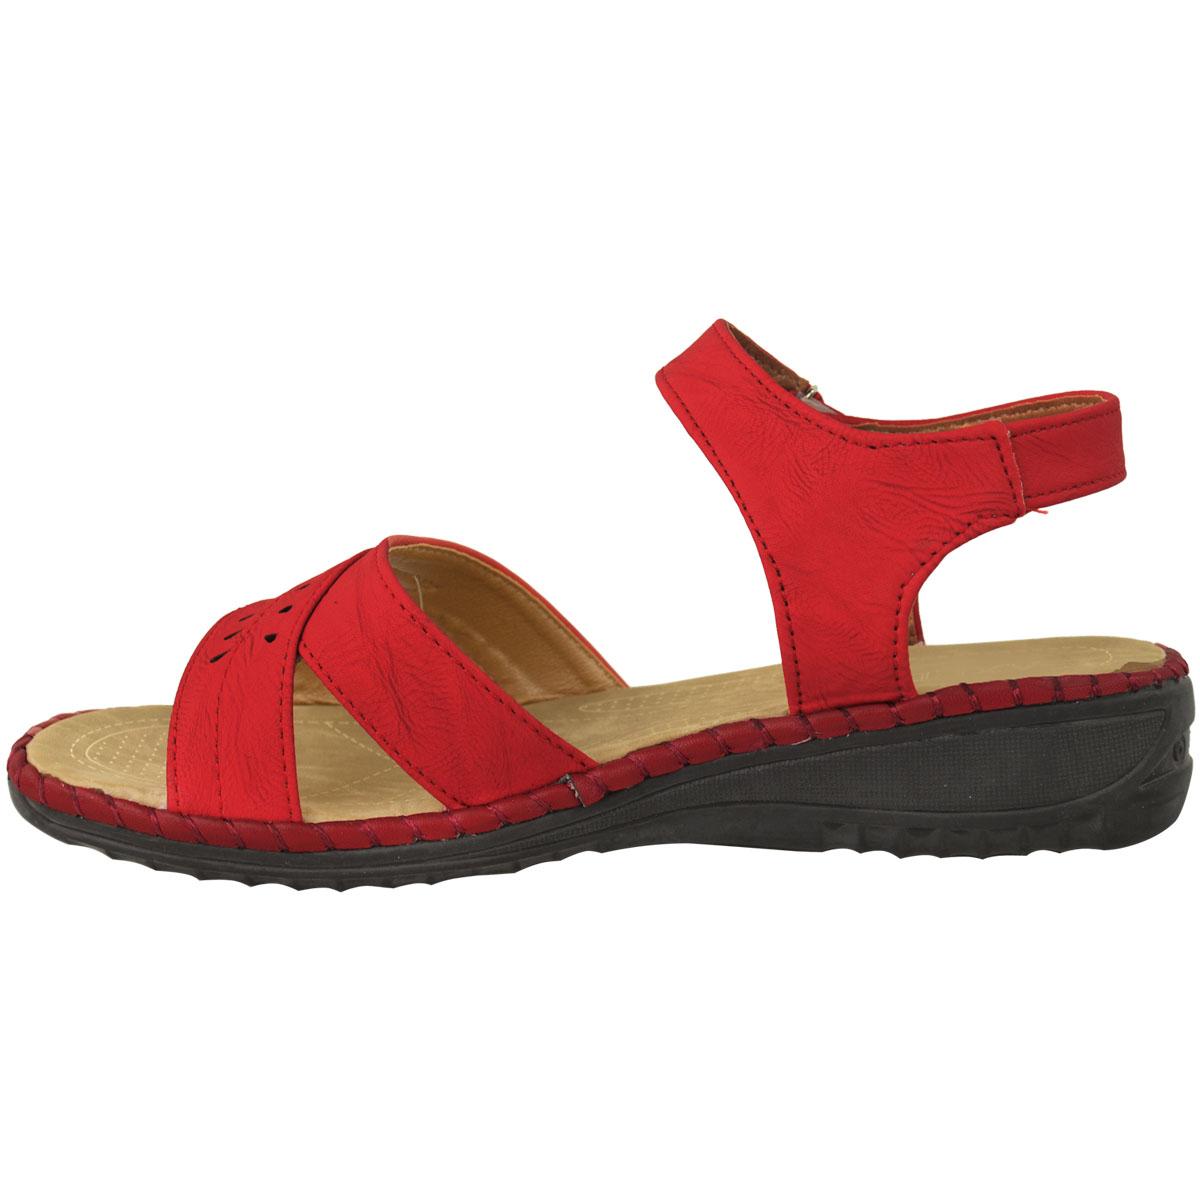 Wide Fit Womens Walking Shoes Uk